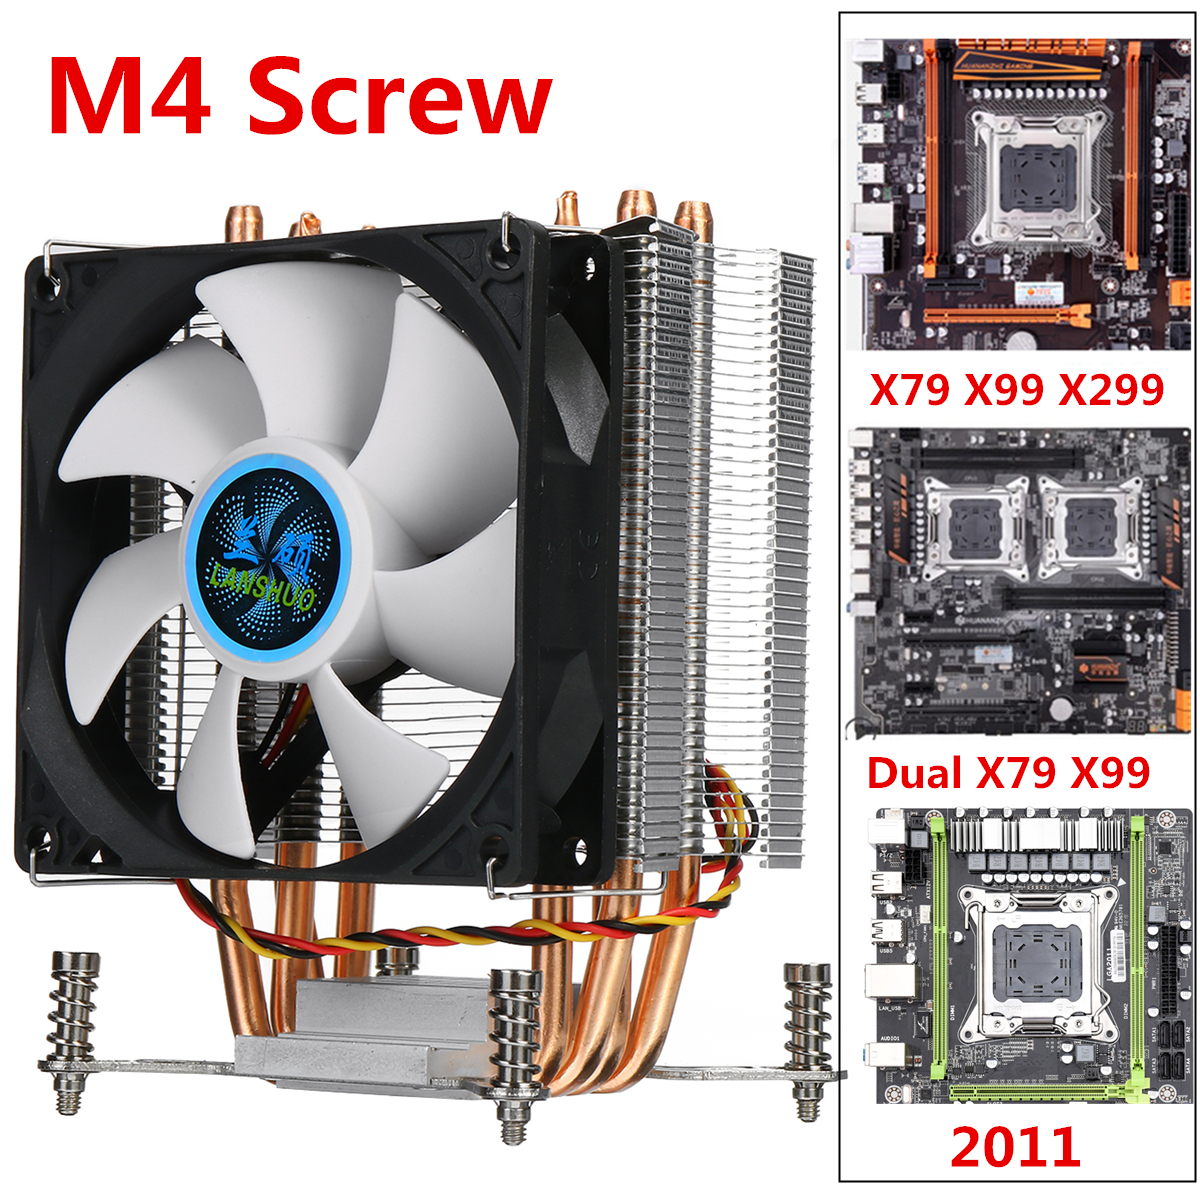 4 Copper Heatpipe CPU Cooler Cooling Fan 90mm 3Pin CPU Cooler Fan Cooling Heatsink Radiator For Intel LGA 2011 X79 X99 299